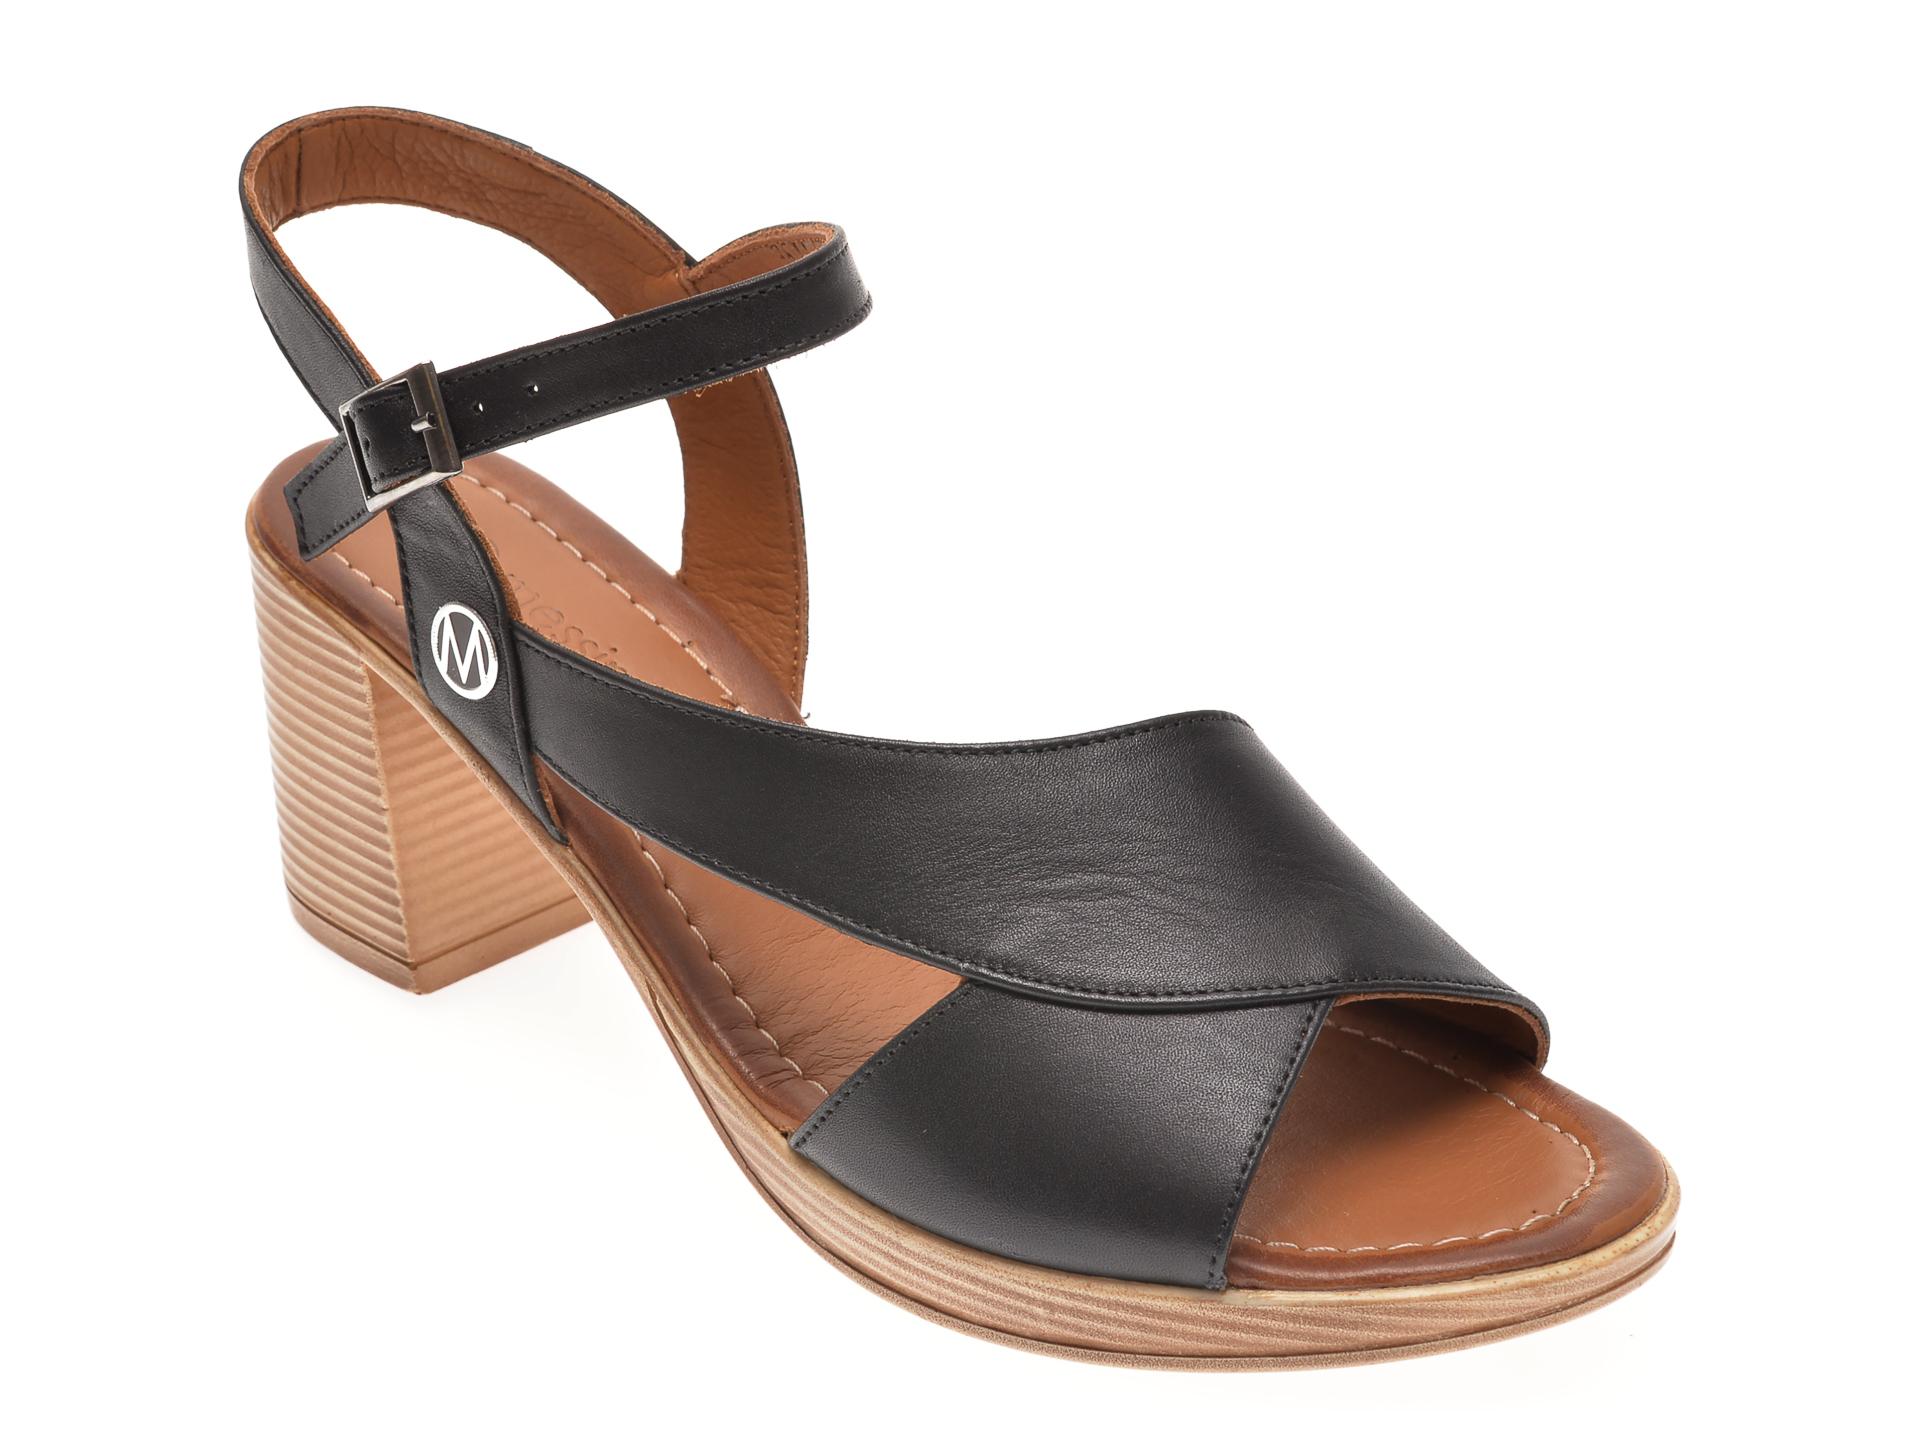 Sandale MESSIMODA negre, 20Y3500, din piele naturala